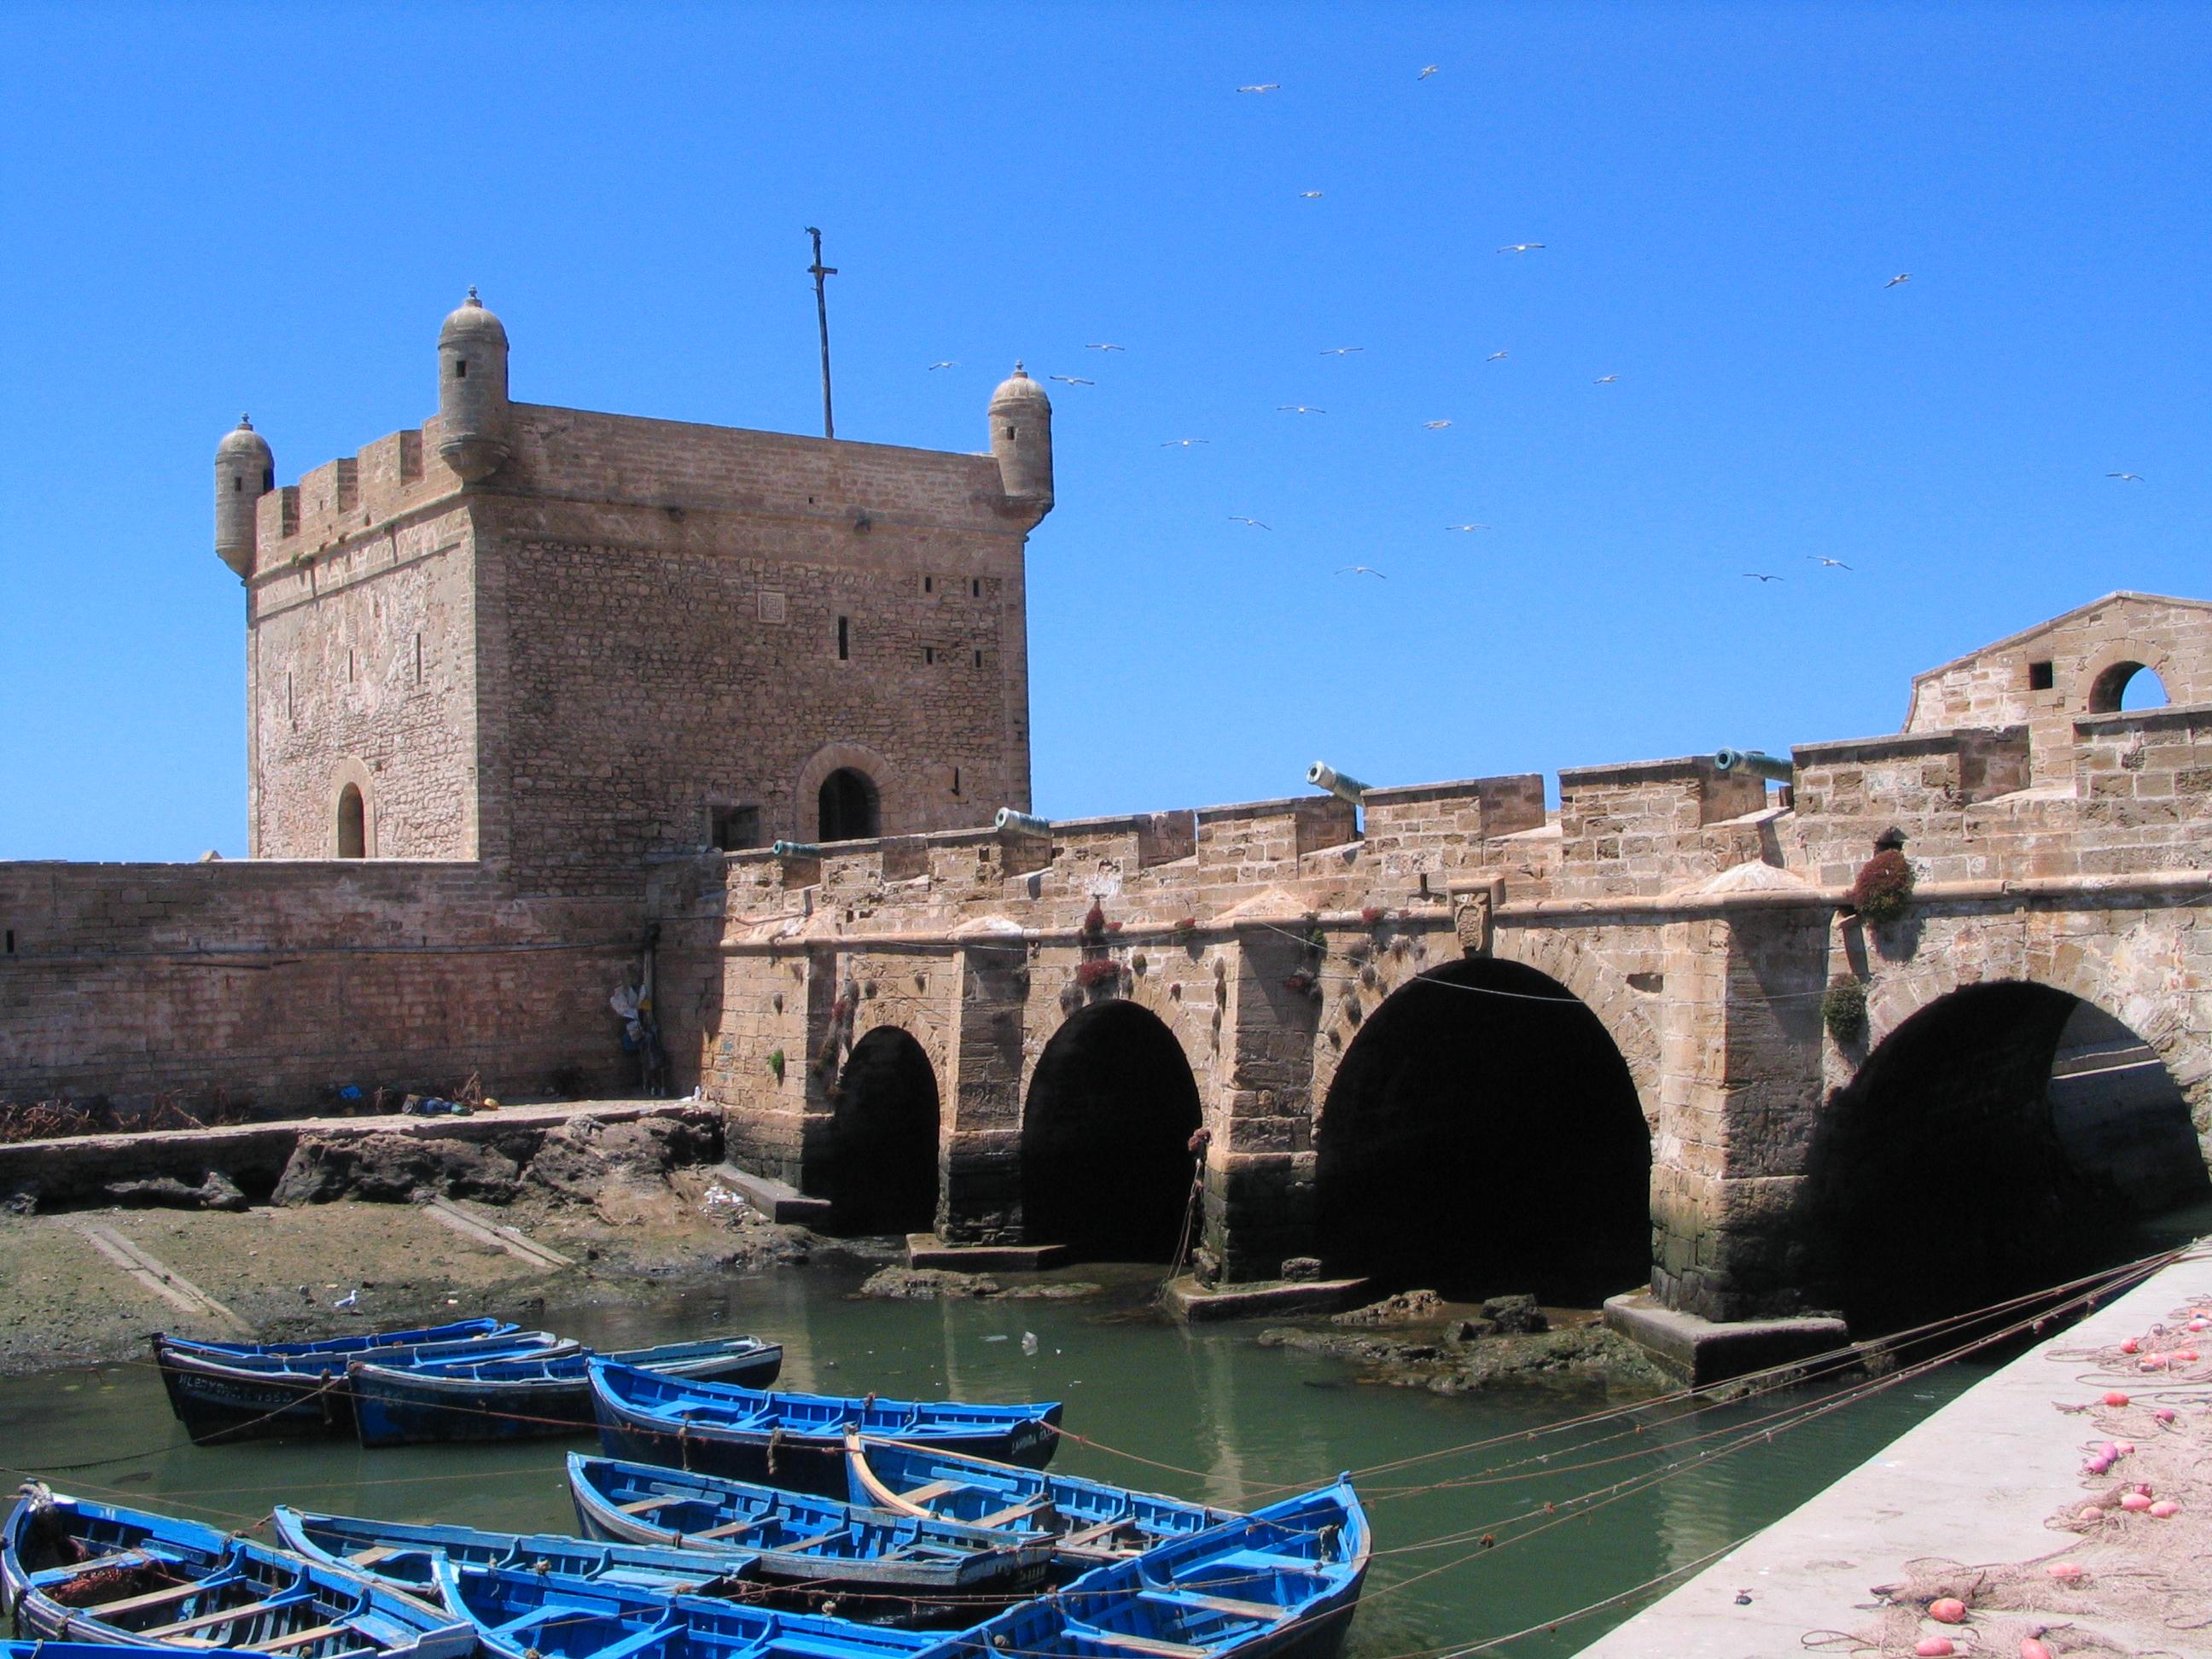 Fichier:Essaouira port remparts 1134.JPG — Wikipédia